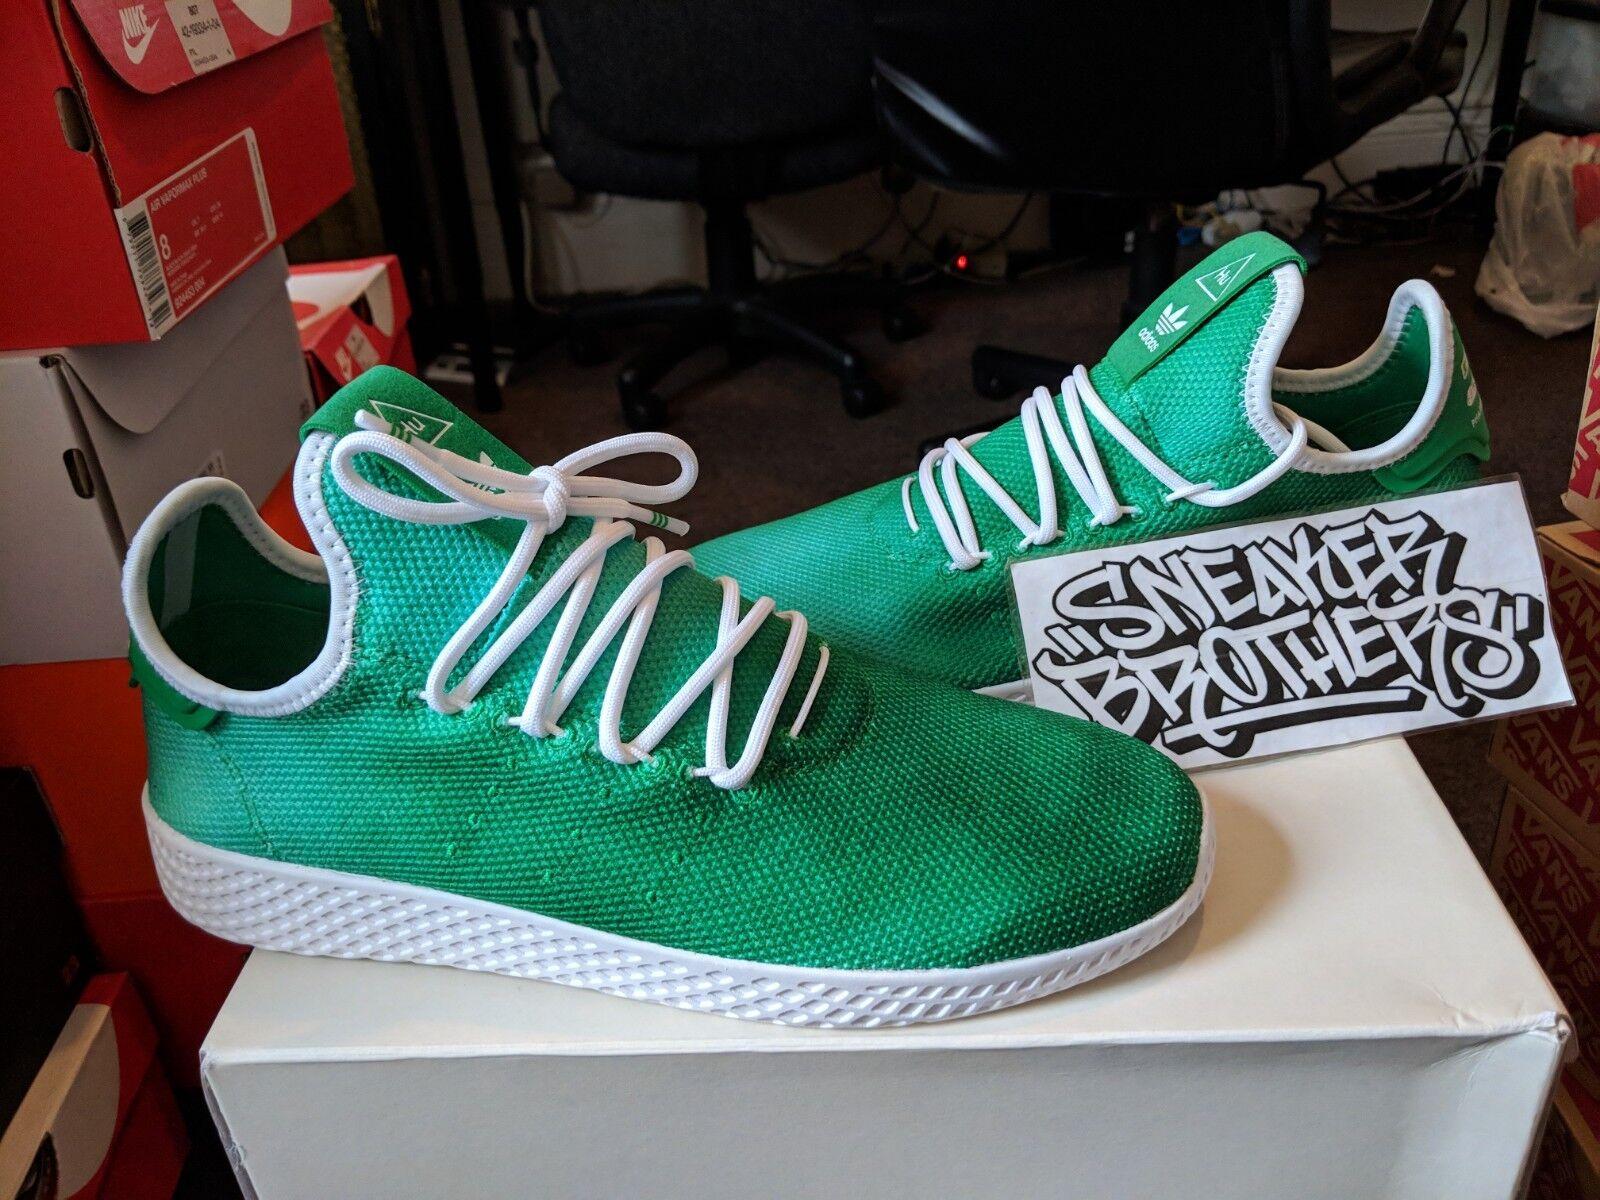 Adidas x Originals PW Tennis Hu Holi Pharrell Williams Bright Green White DA9619 best-selling model of the brand